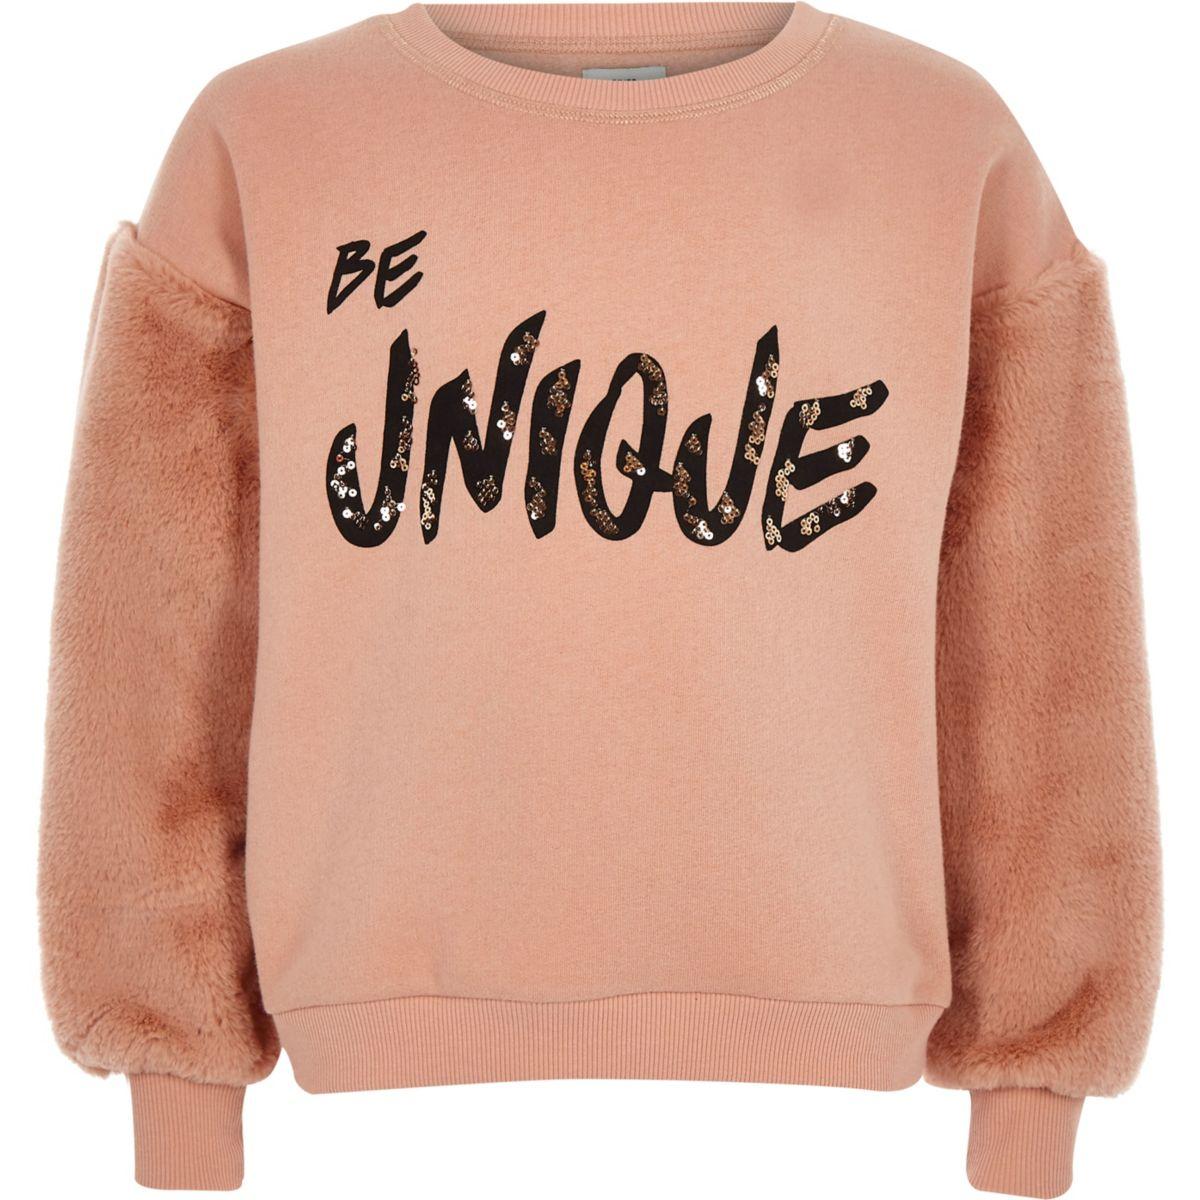 Girls light pink faux fur sleeve sweatshirt